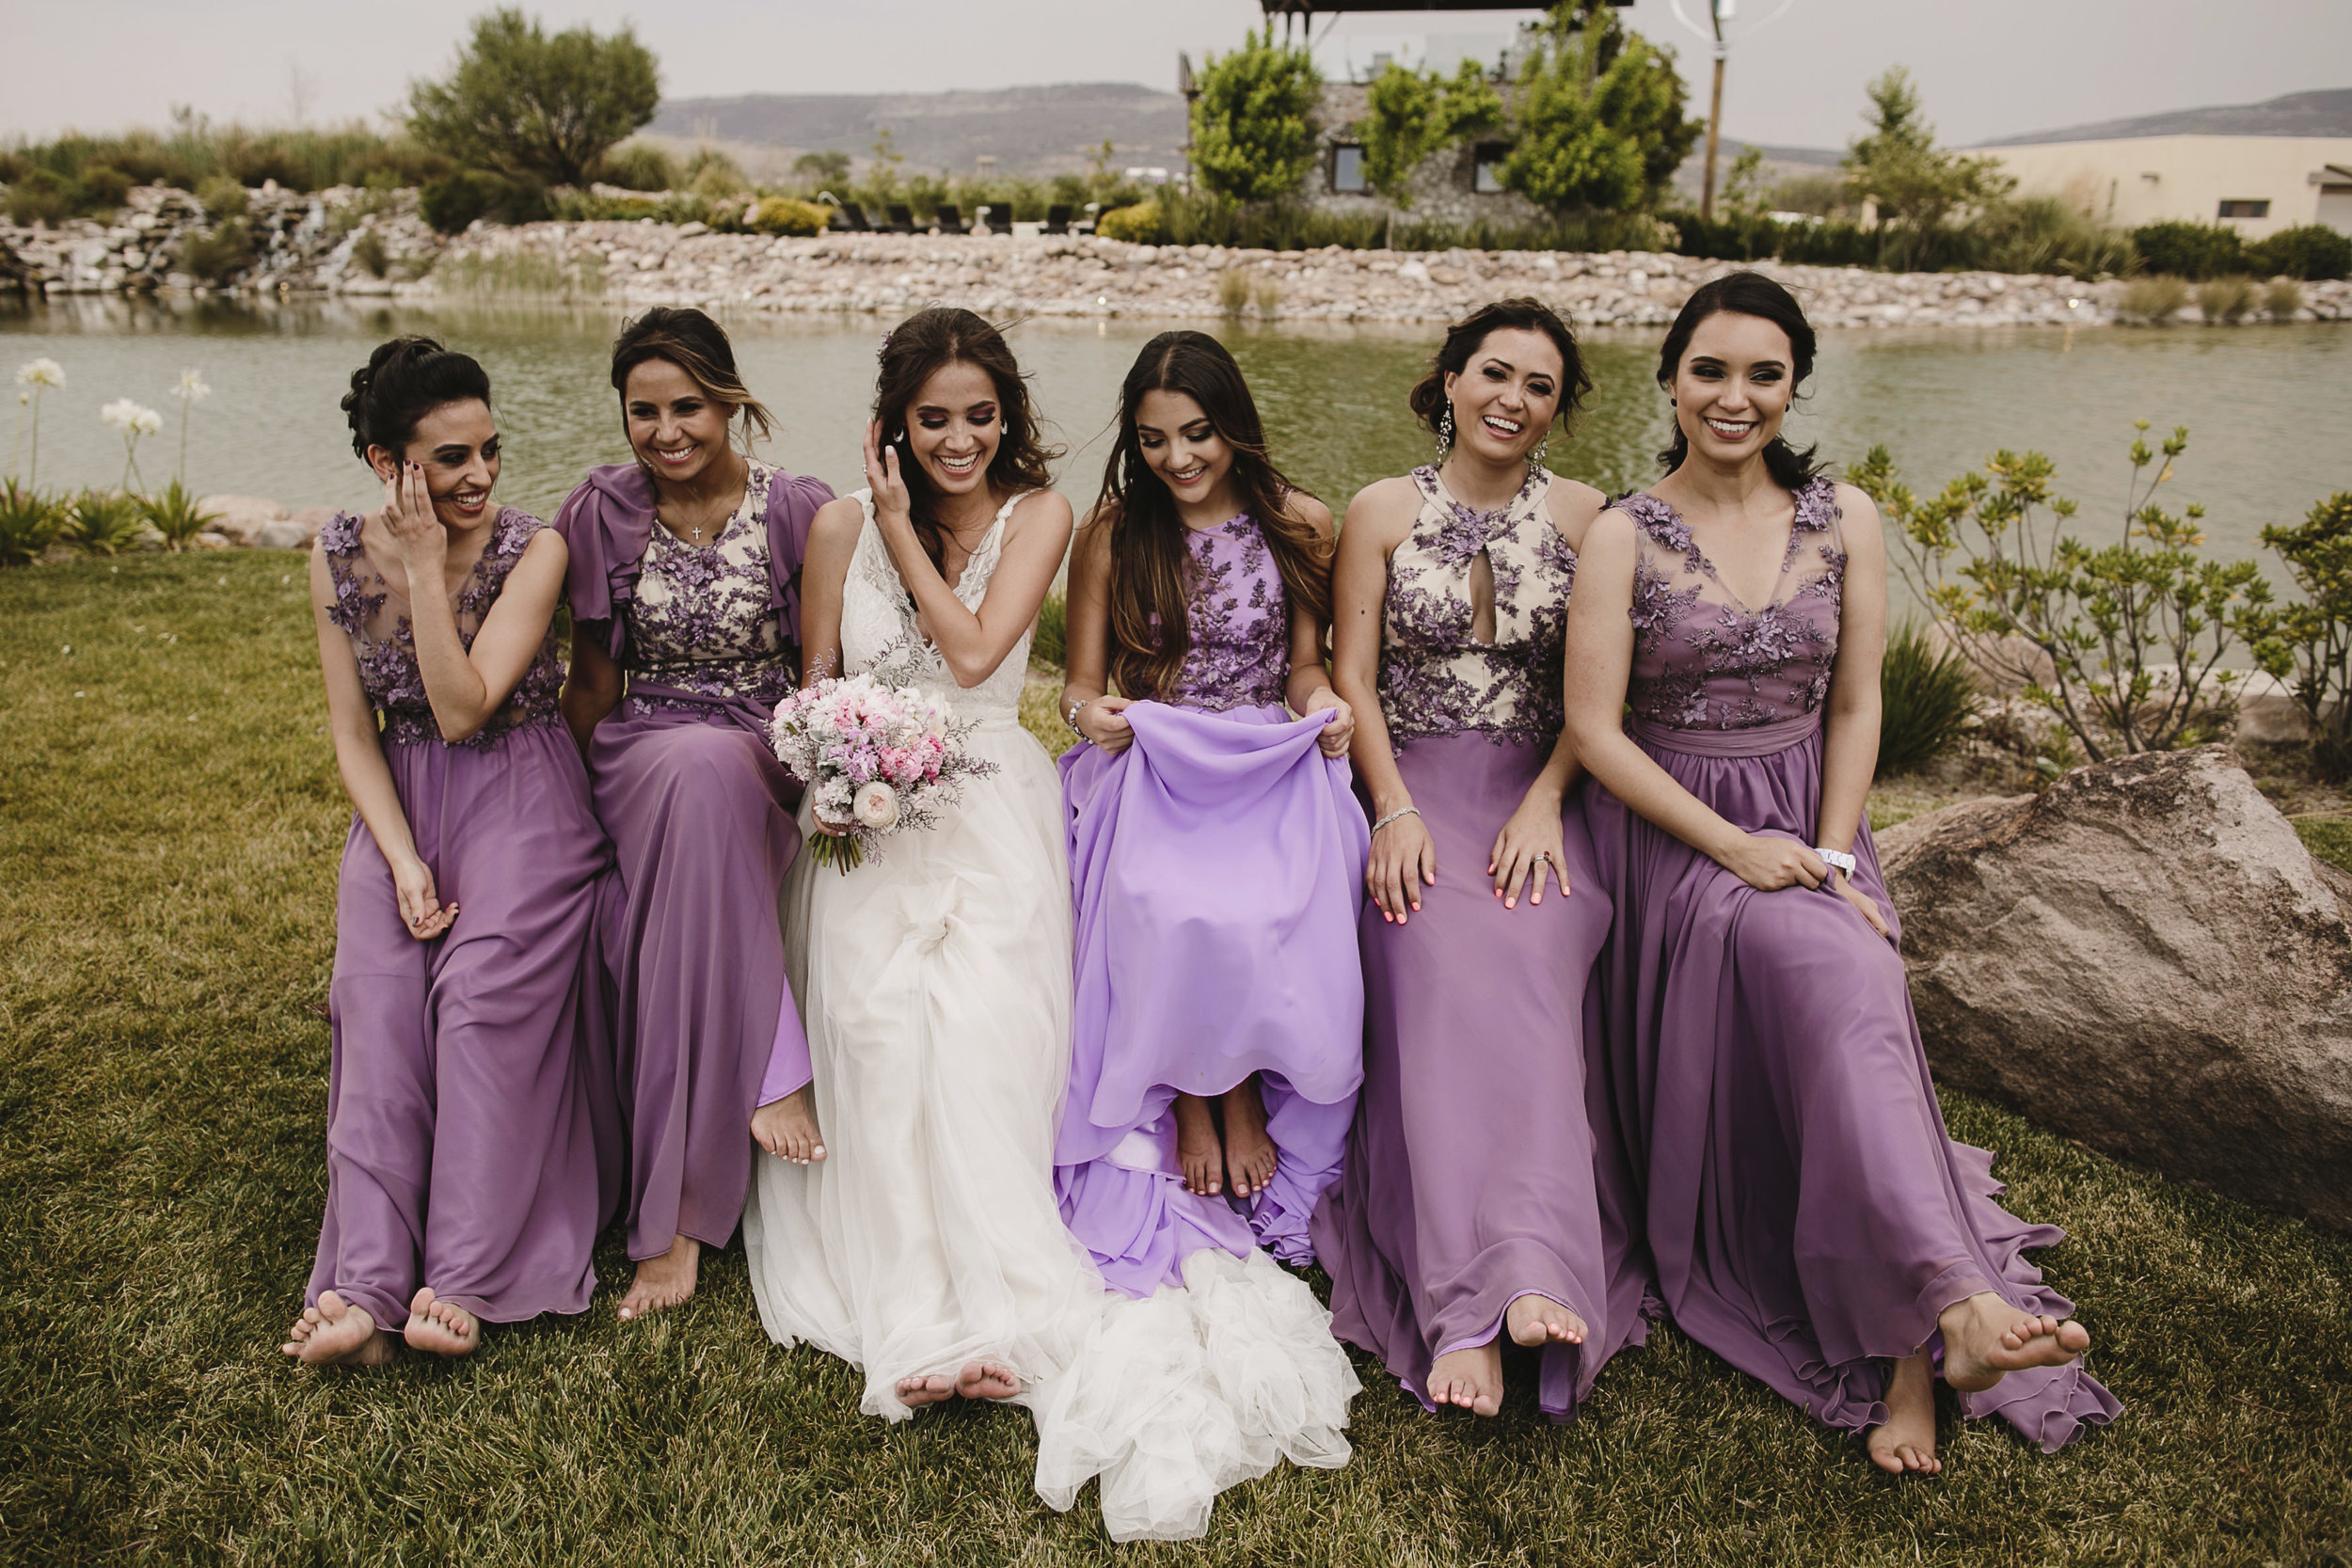 alfons_flores_destination_wedding_photography_mavi_david-1229.JPG